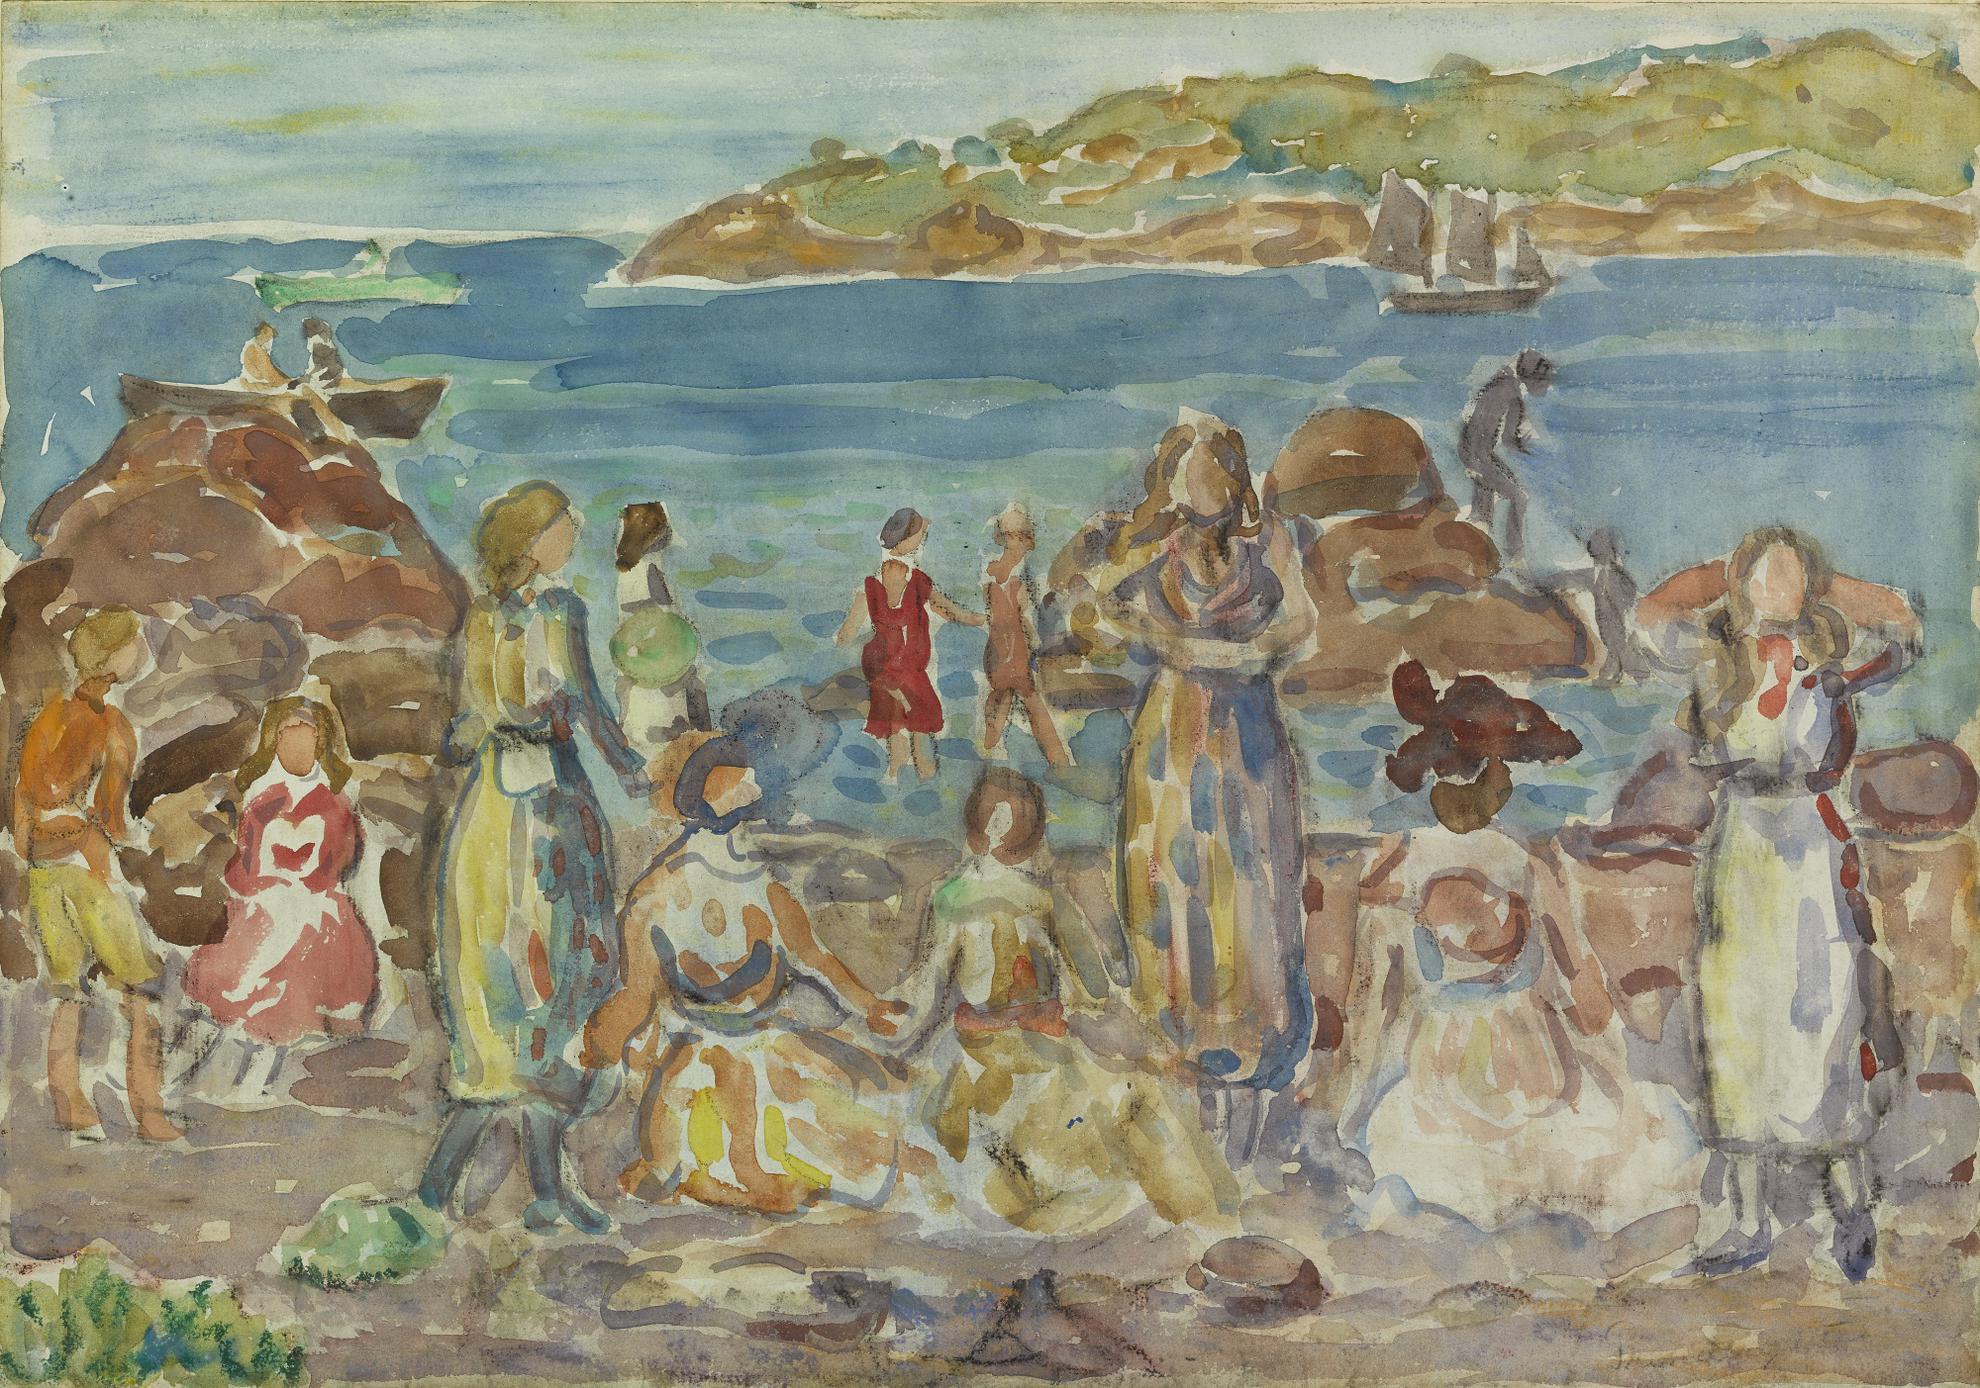 Maurice Brazil Prendergast-Beach Scene, New England-1919